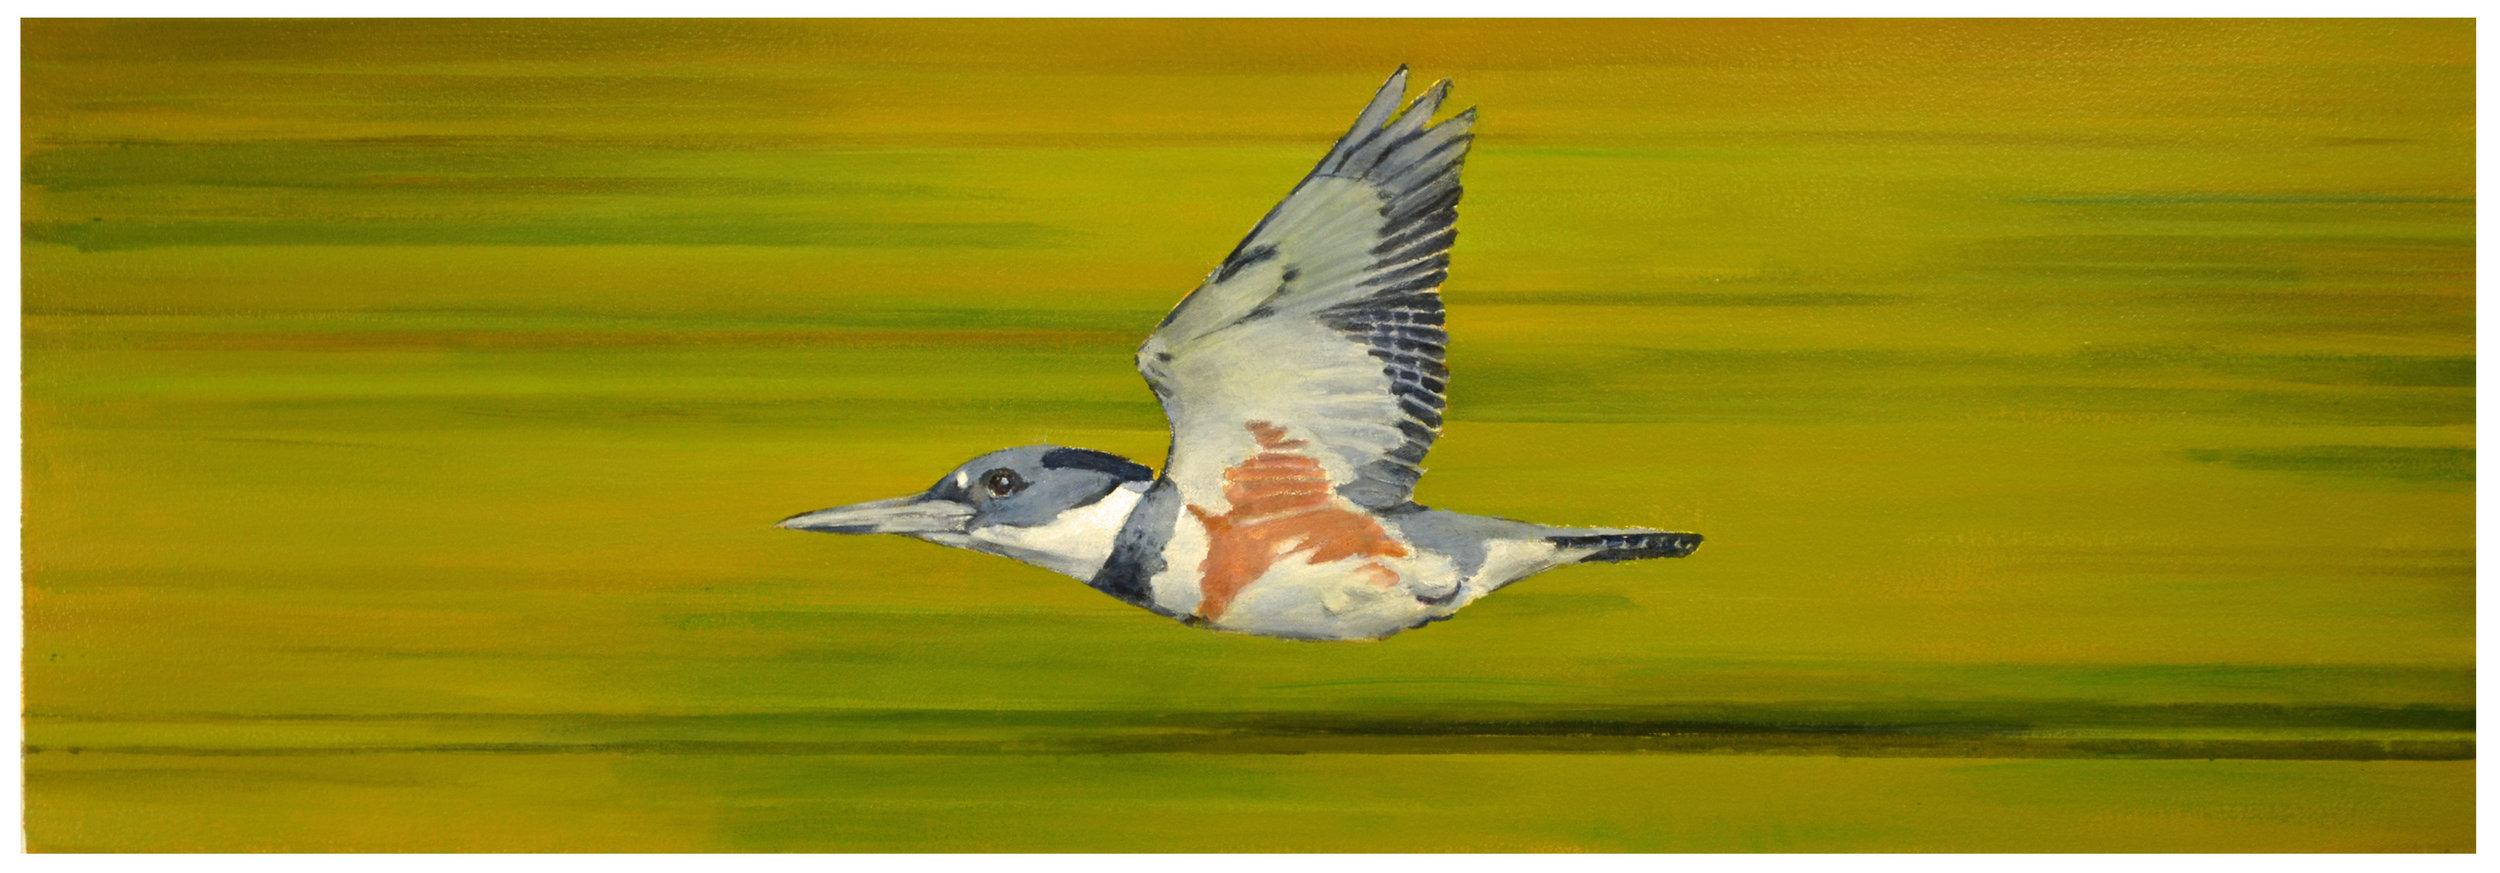 Bird in Flight - Belted Kingfisher